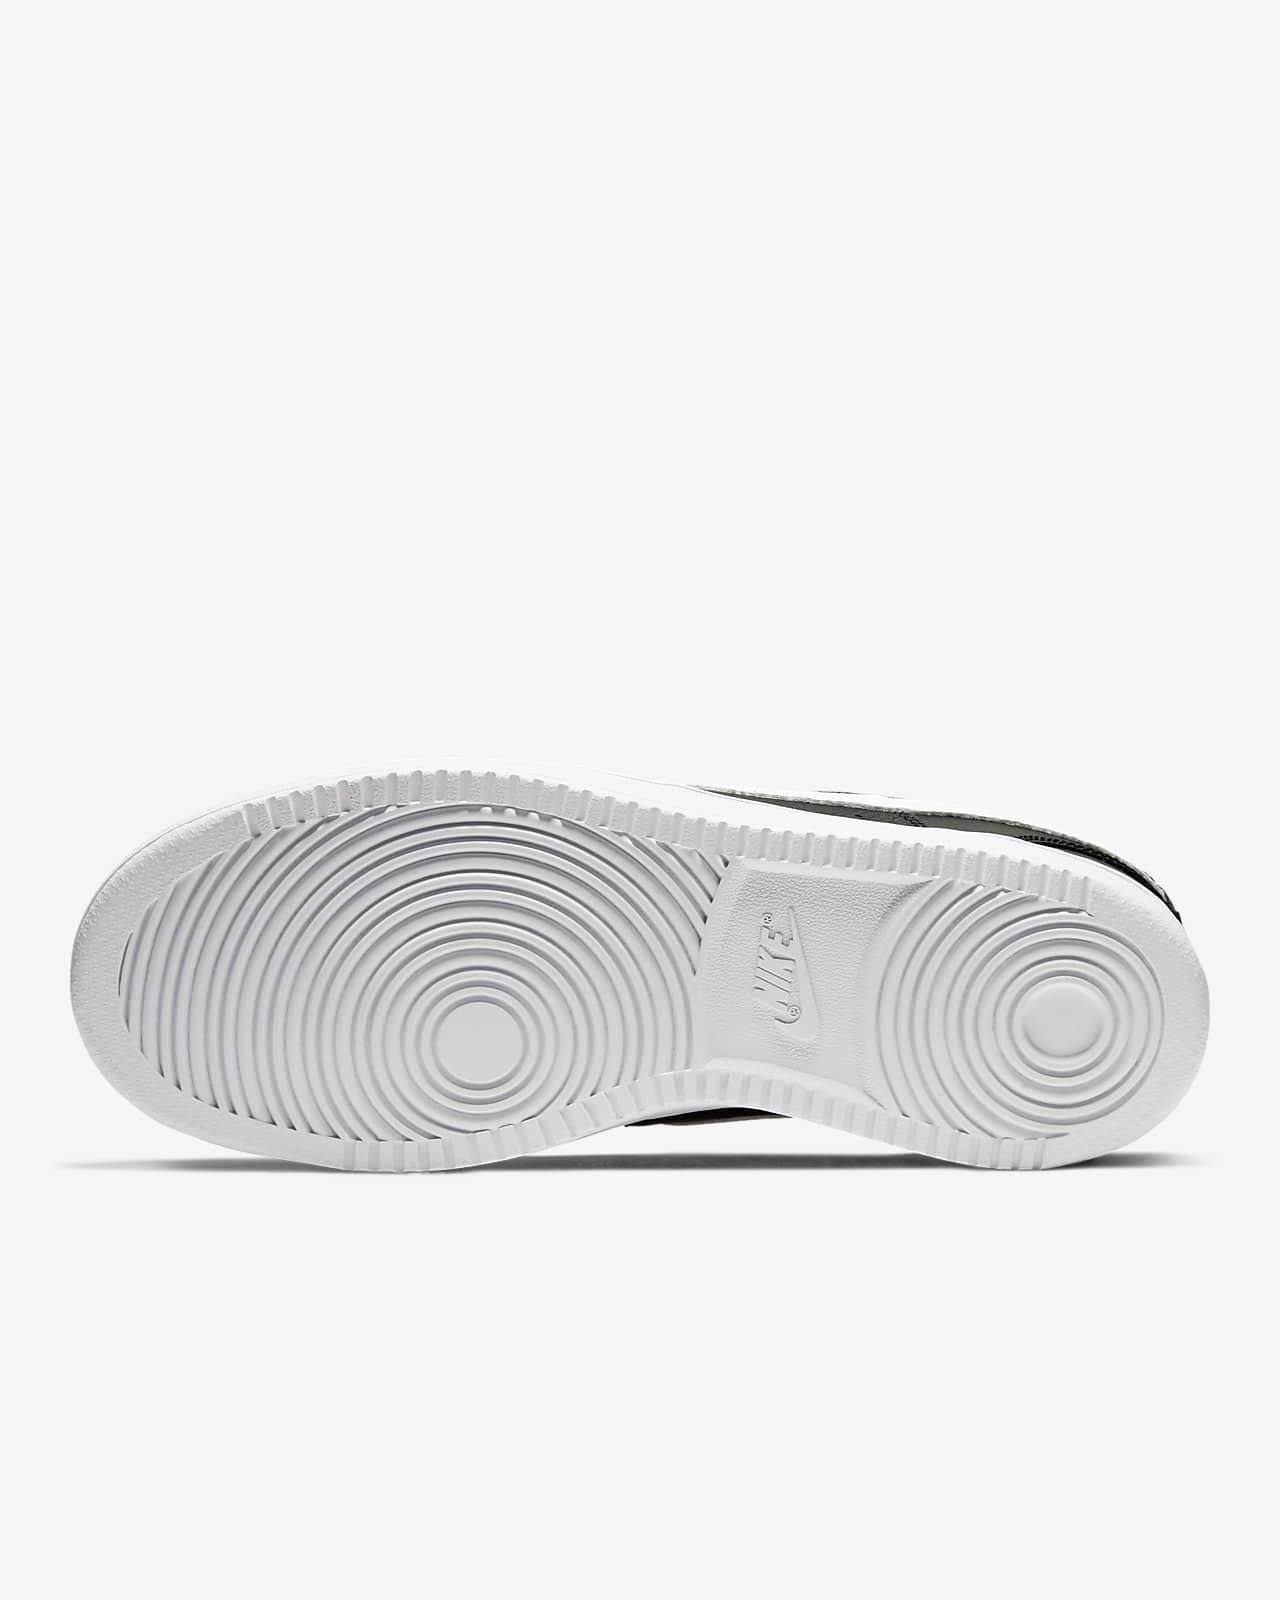 nike white sneakers price